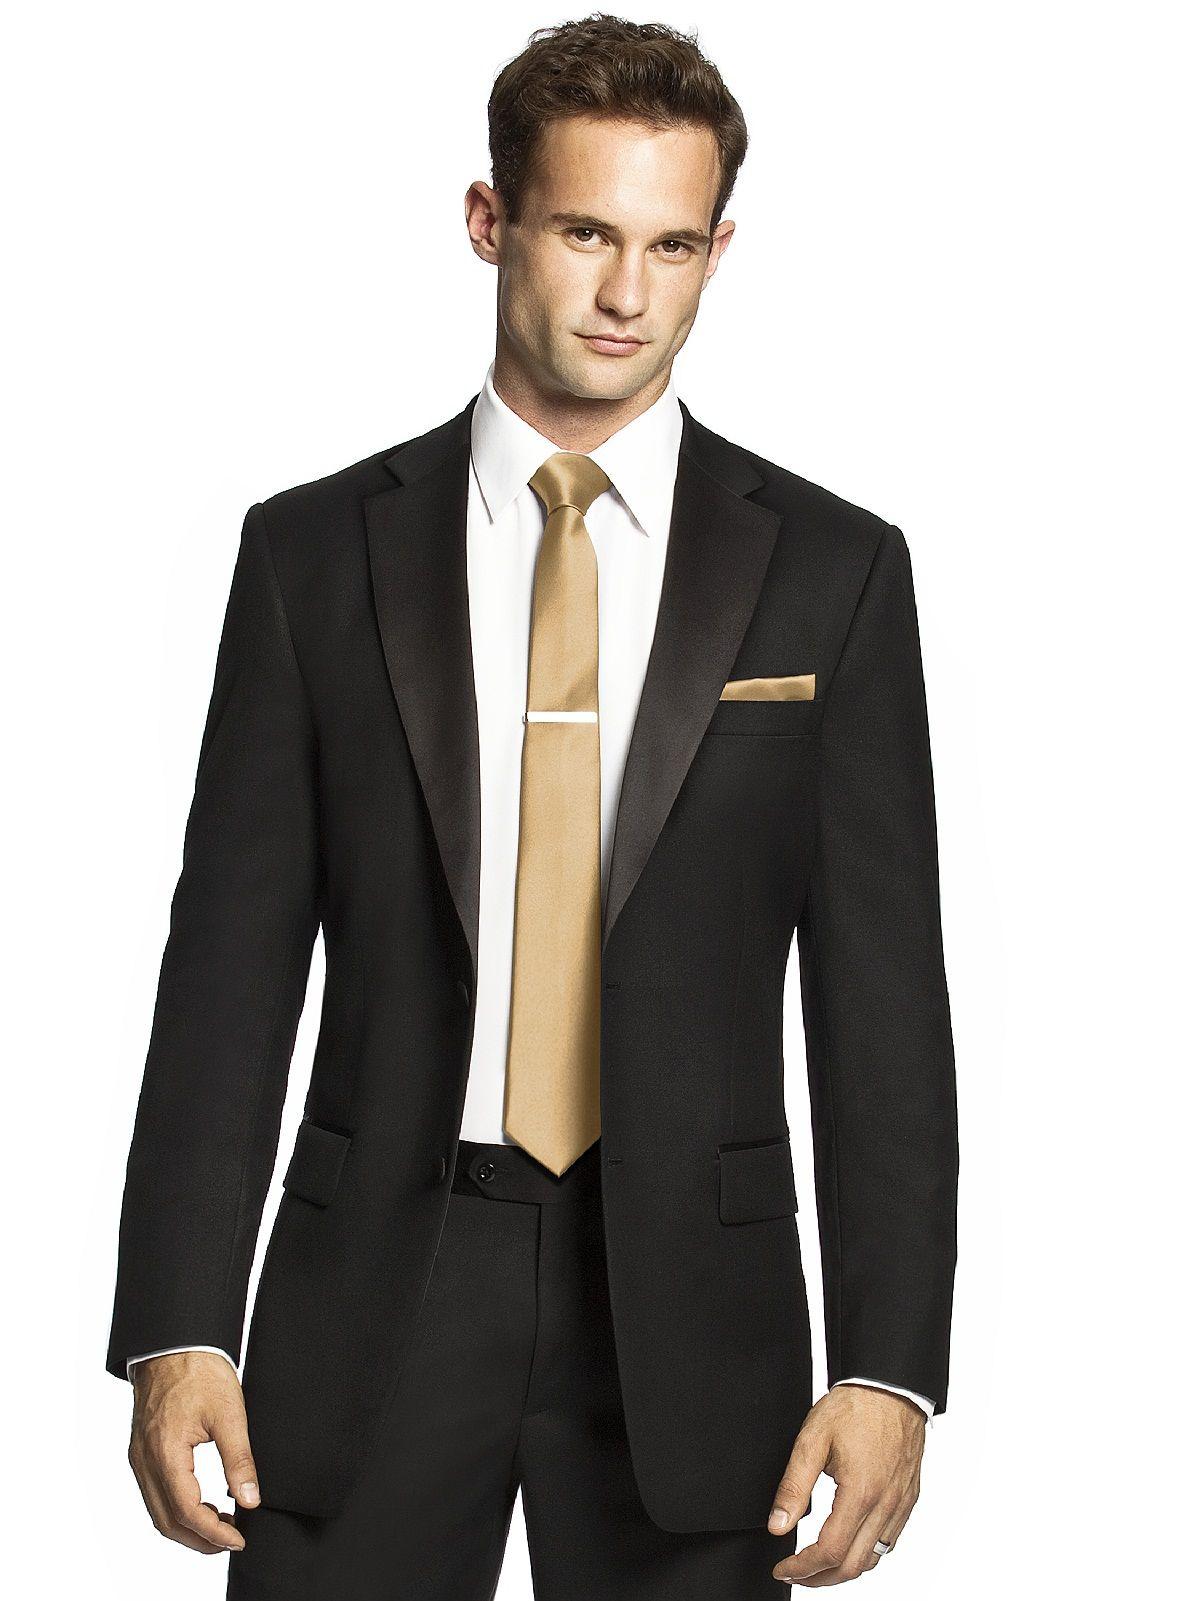 Light gold ties for the groomsmen